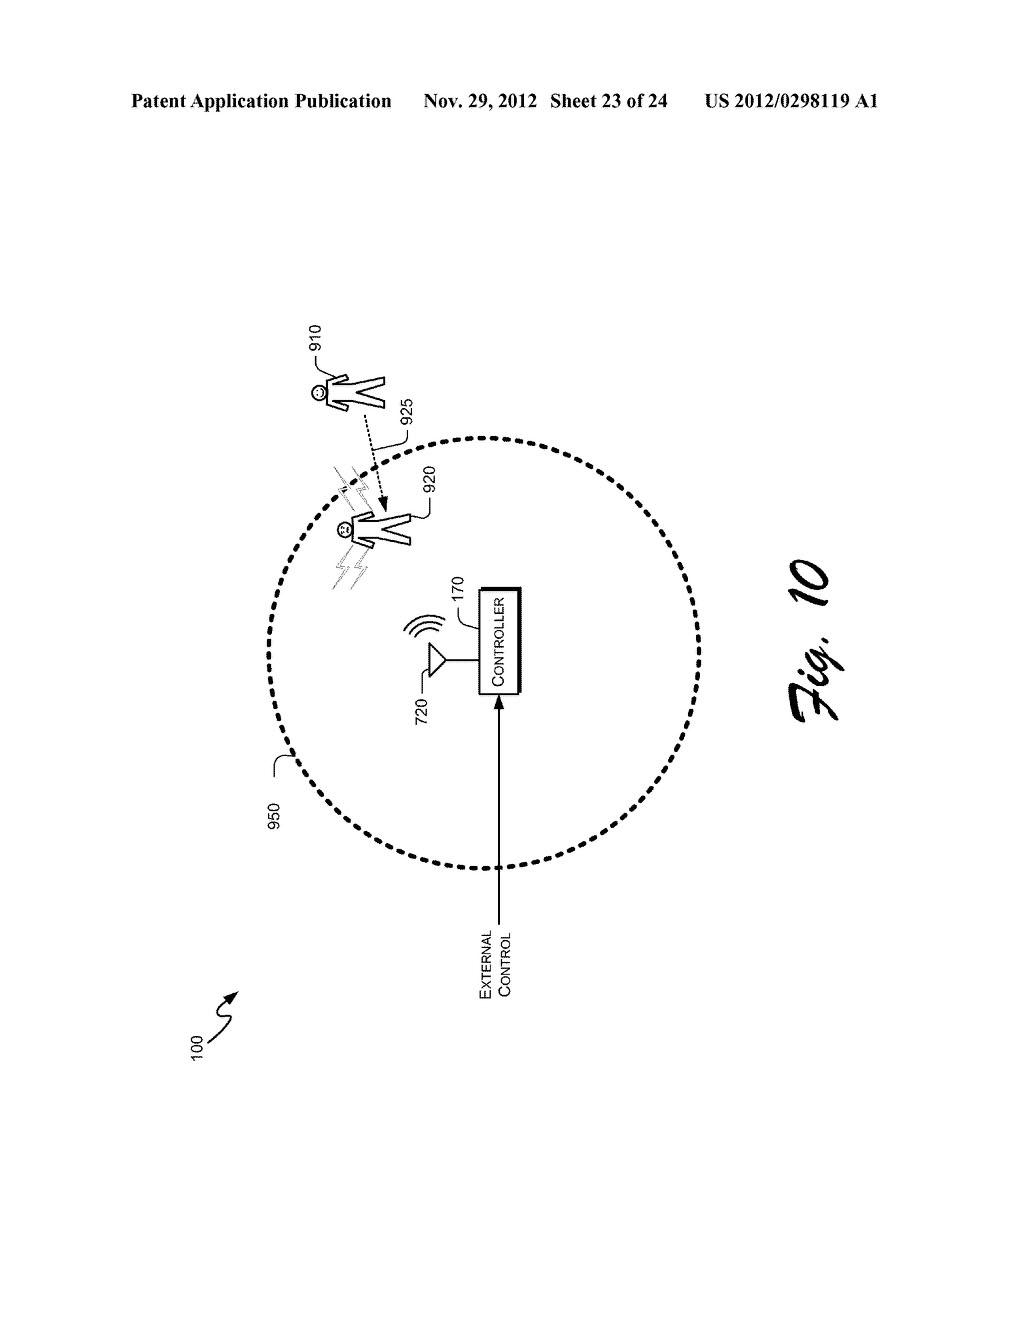 handcuffs-patent24